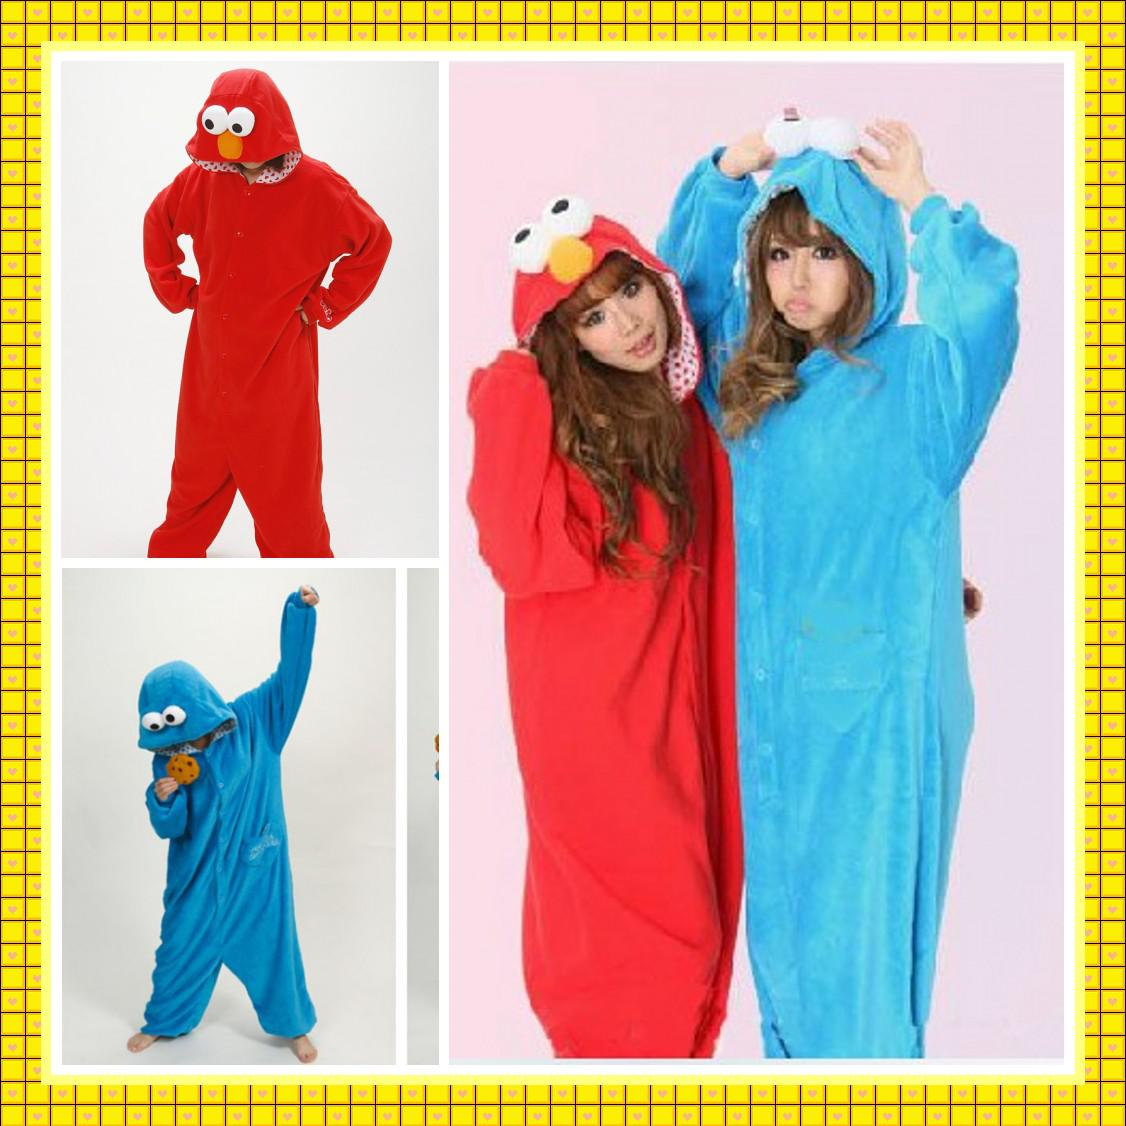 new in stock halloween sesame street cookie monster unisex adult animal onesies pajamas jumpsuits red blue homewear cheap cosplay costumes group halloween